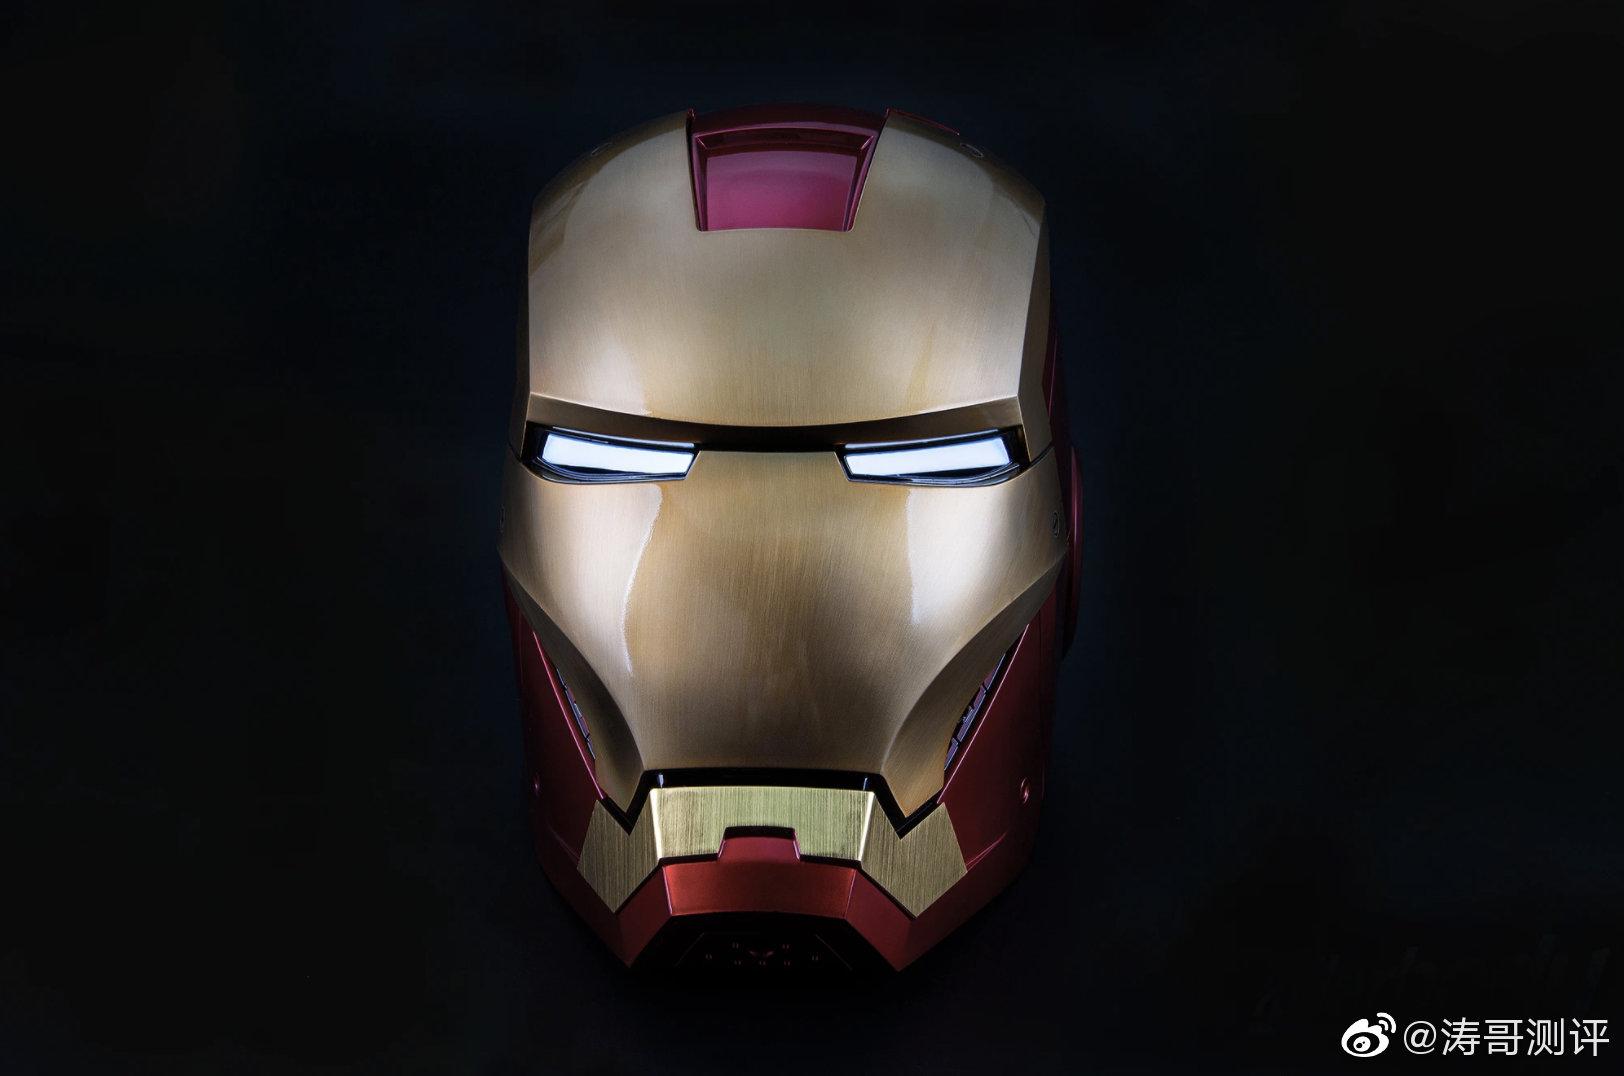 Killer body推出了一款1/1的可穿戴钢铁侠MK7头盔